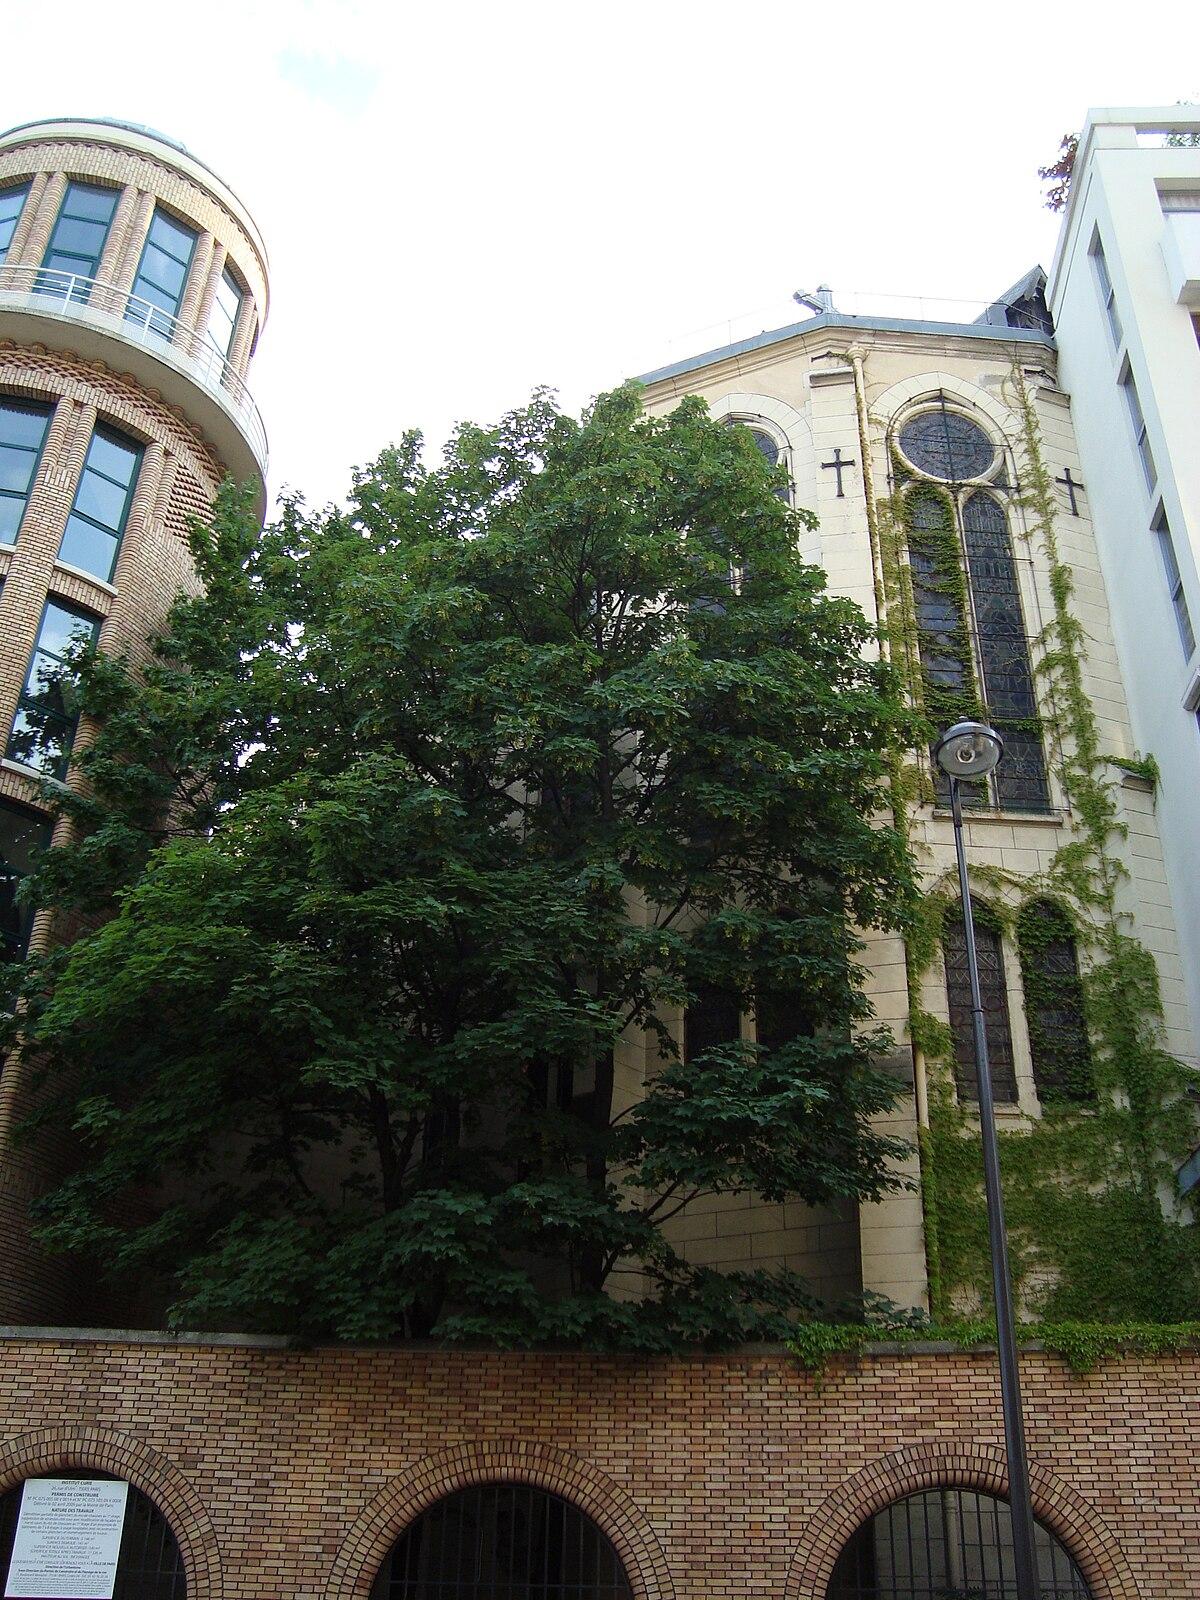 Catedral de nuestra se ora del l bano par s wikipedia for Paris libre